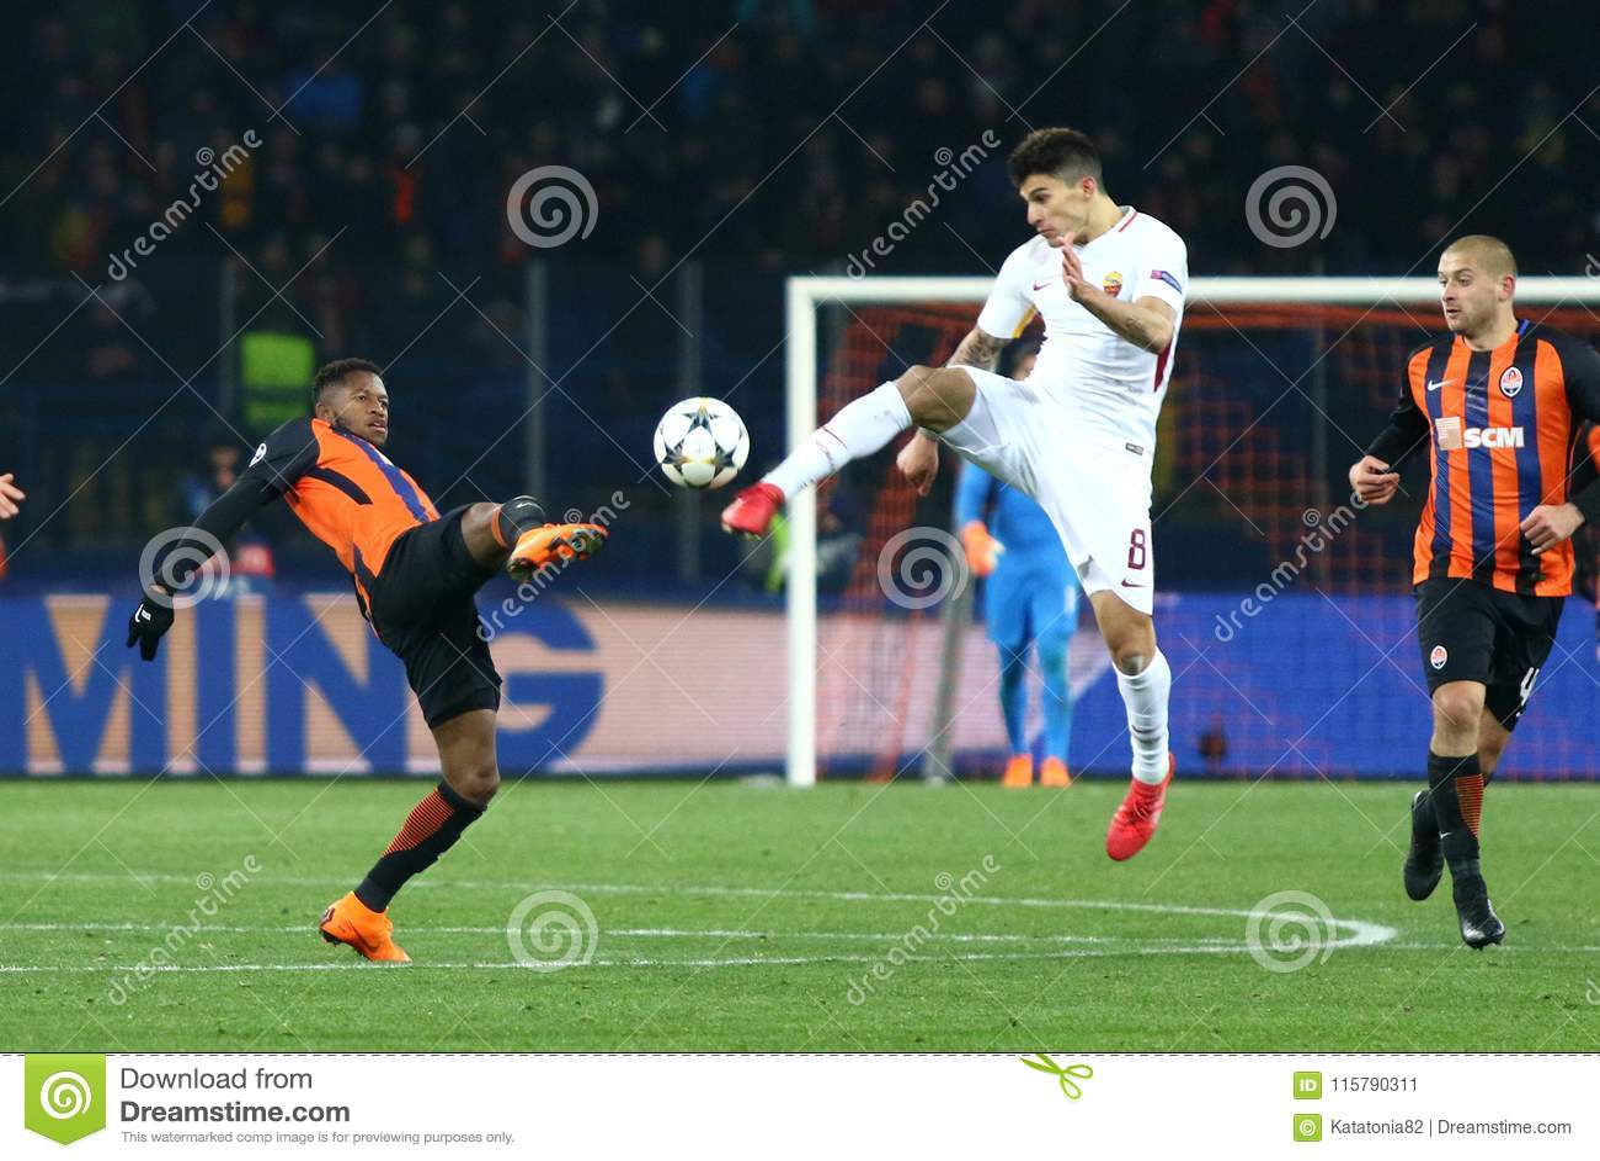 Ukrainian Football Championship in 2018-2019 83